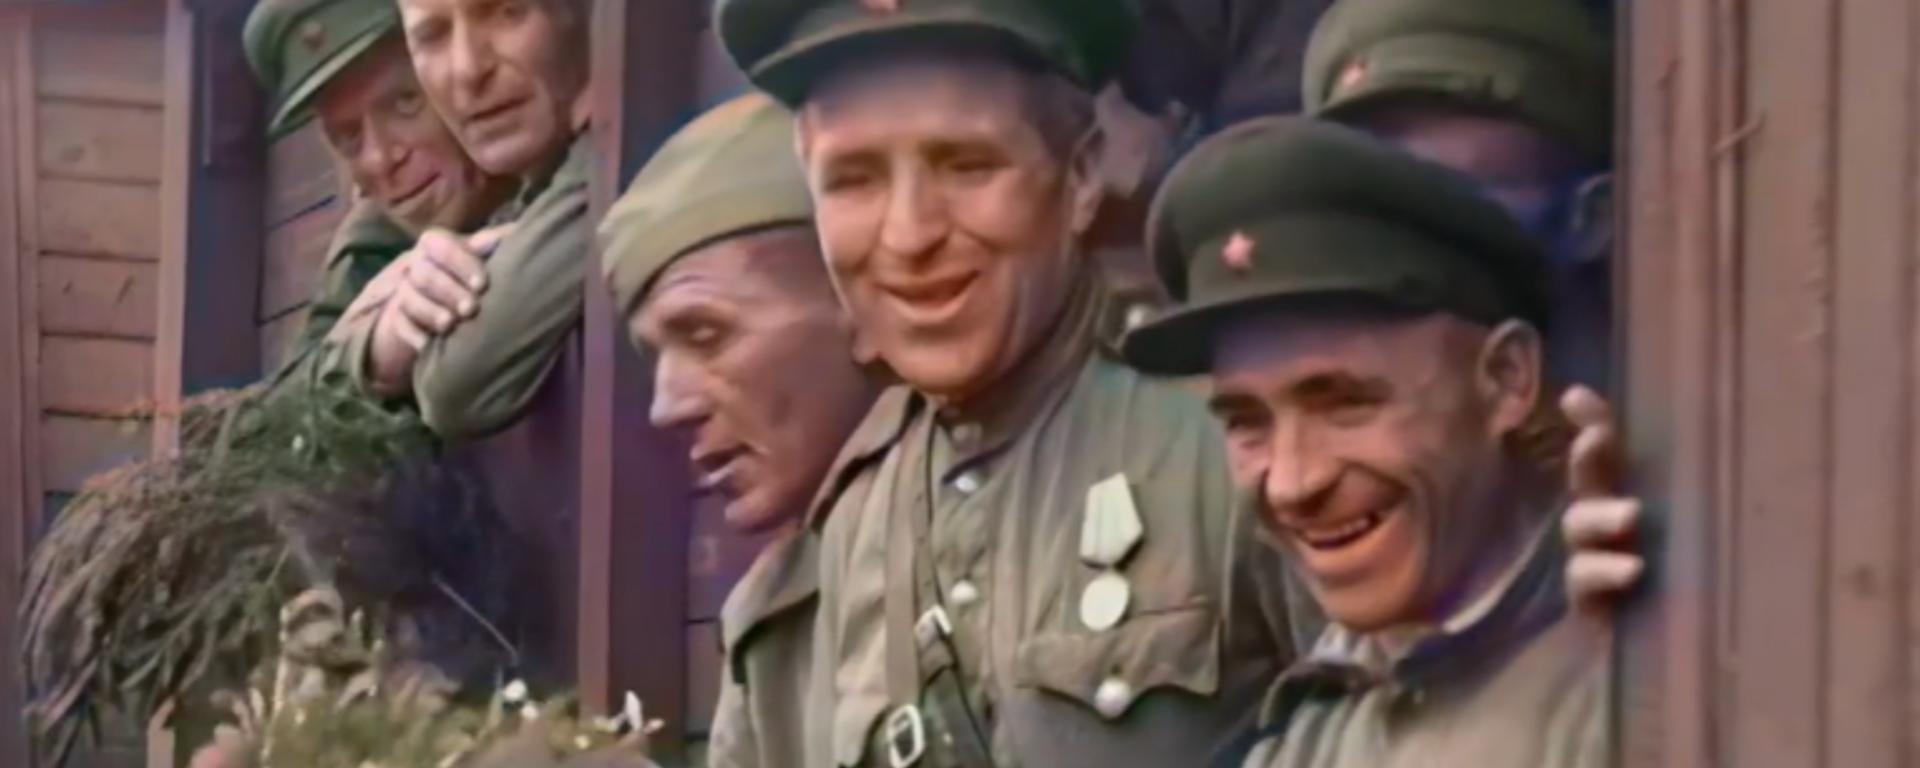 La victoria de la URSS en la II Guerra Mundial, como nunca la habías visto - Sputnik Mundo, 1920, 06.05.2021